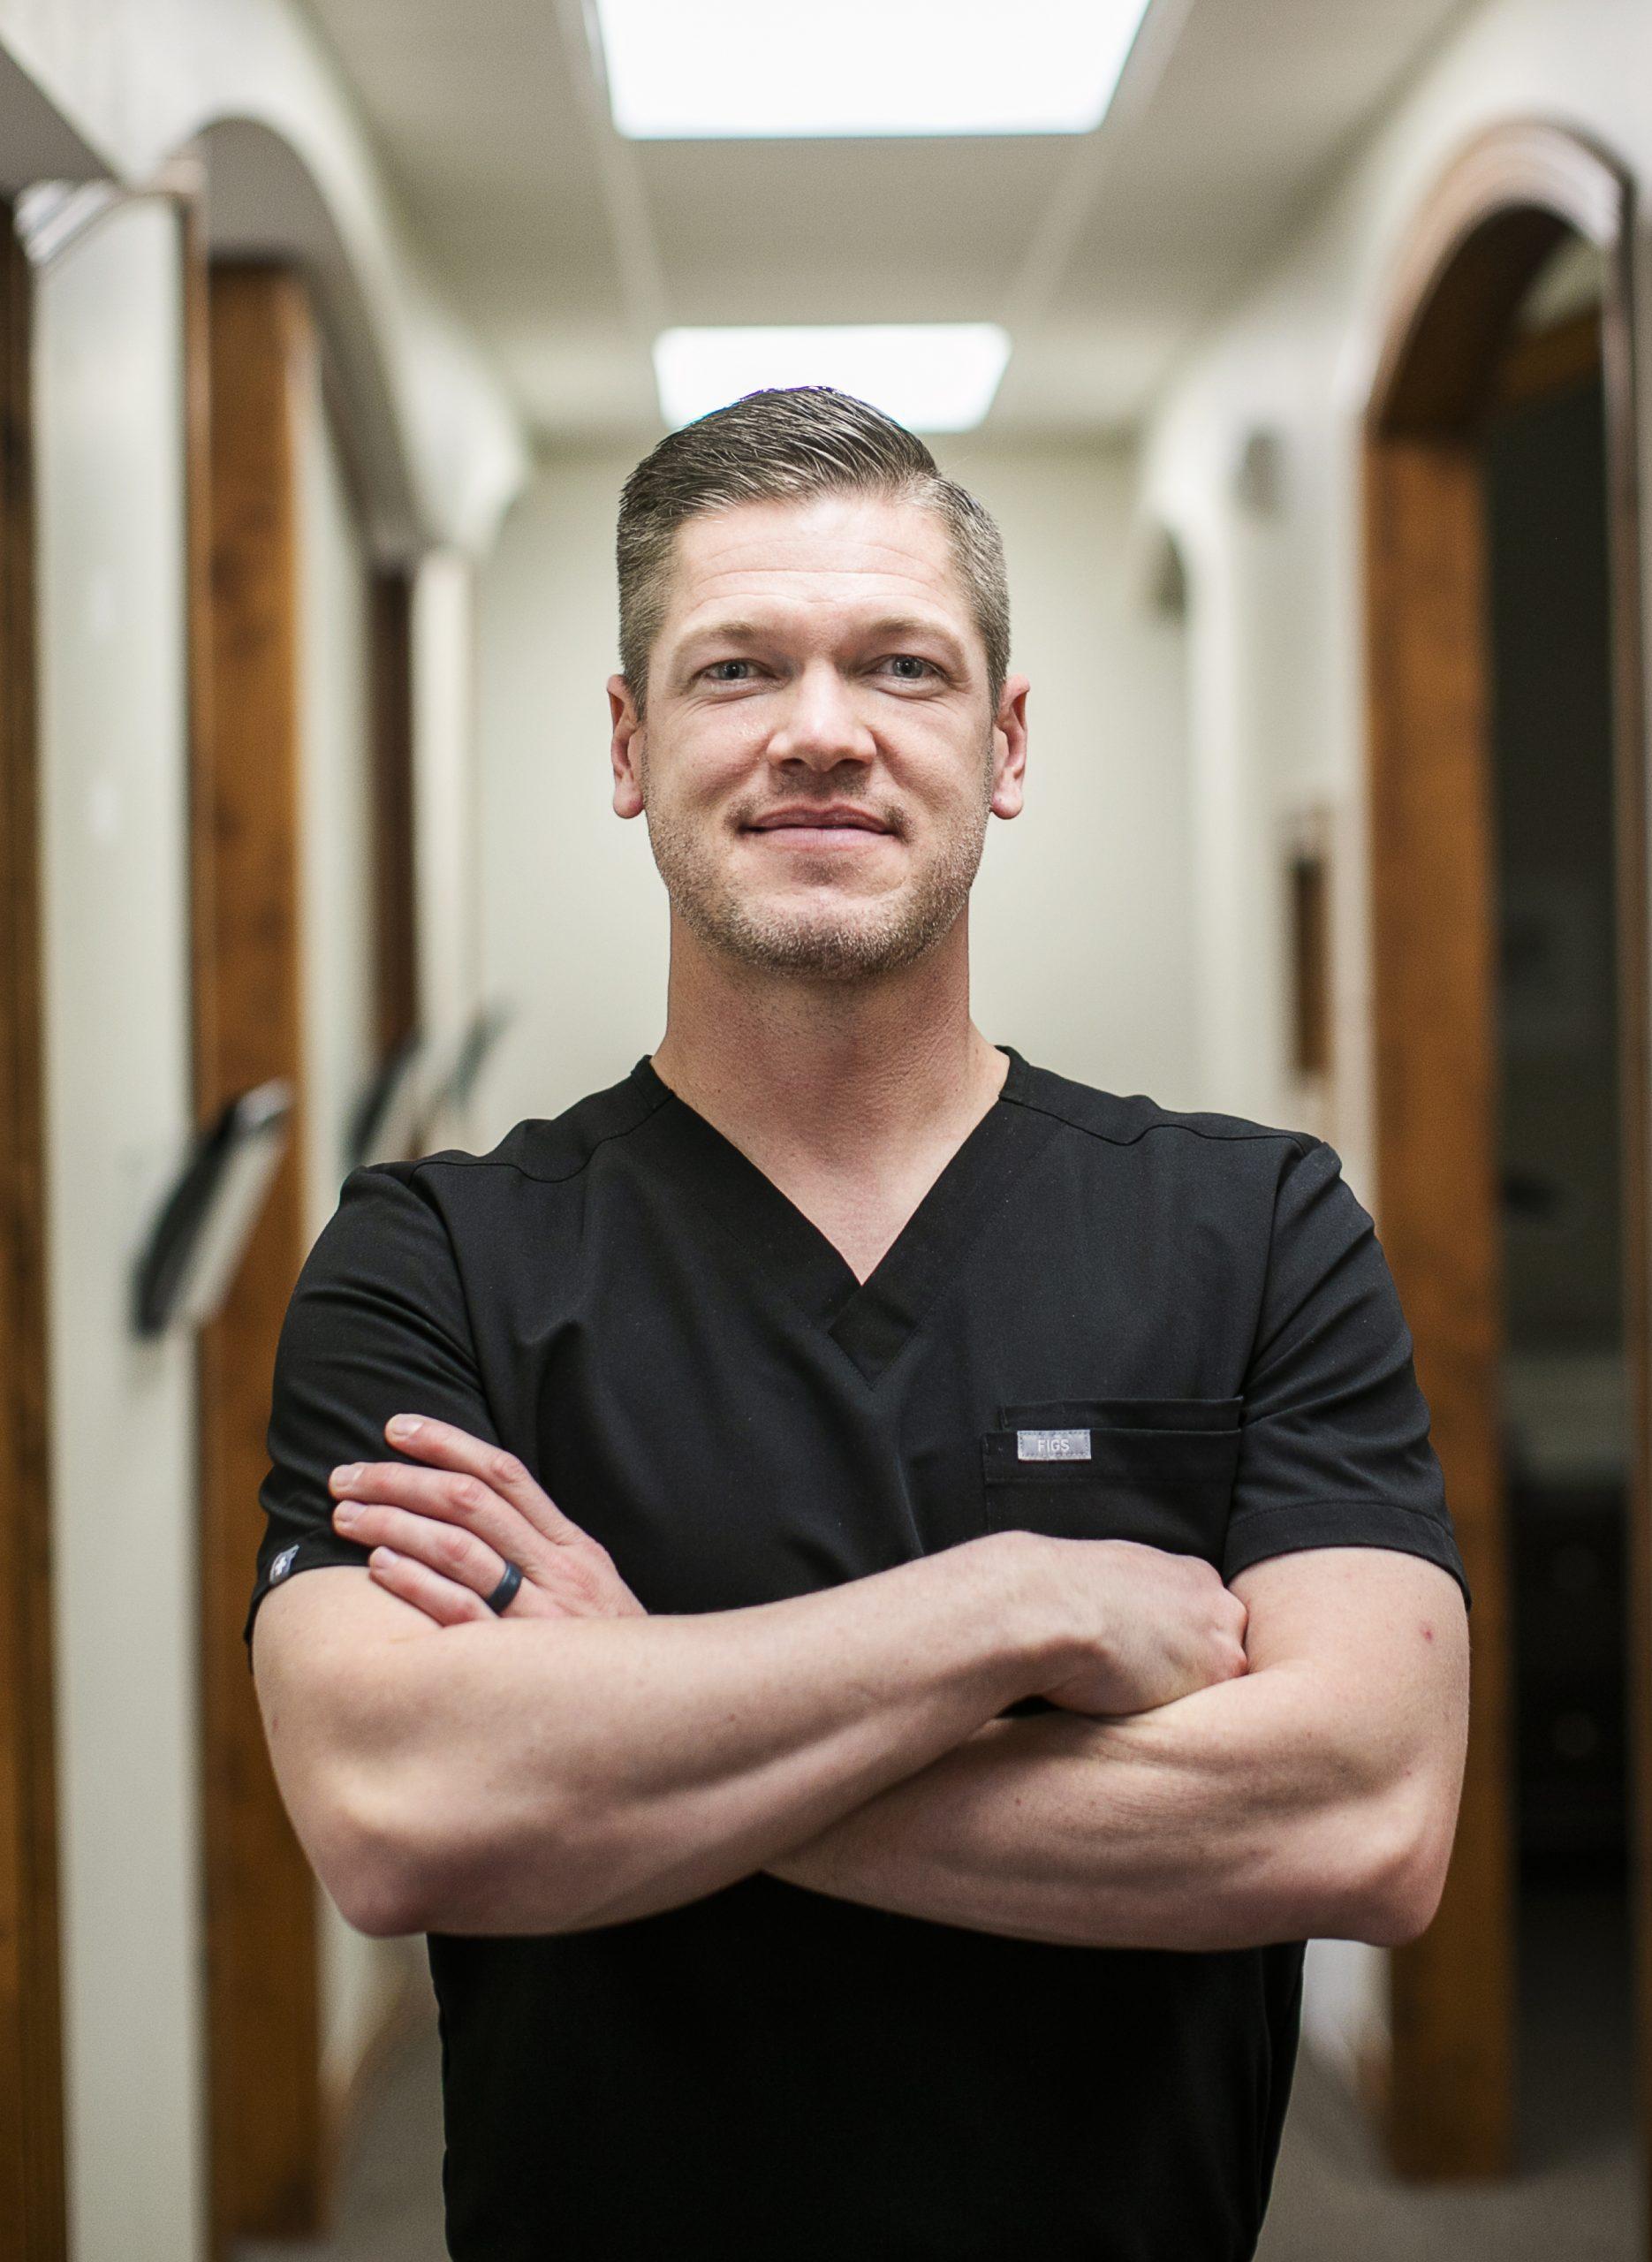 Dr. Jenkins